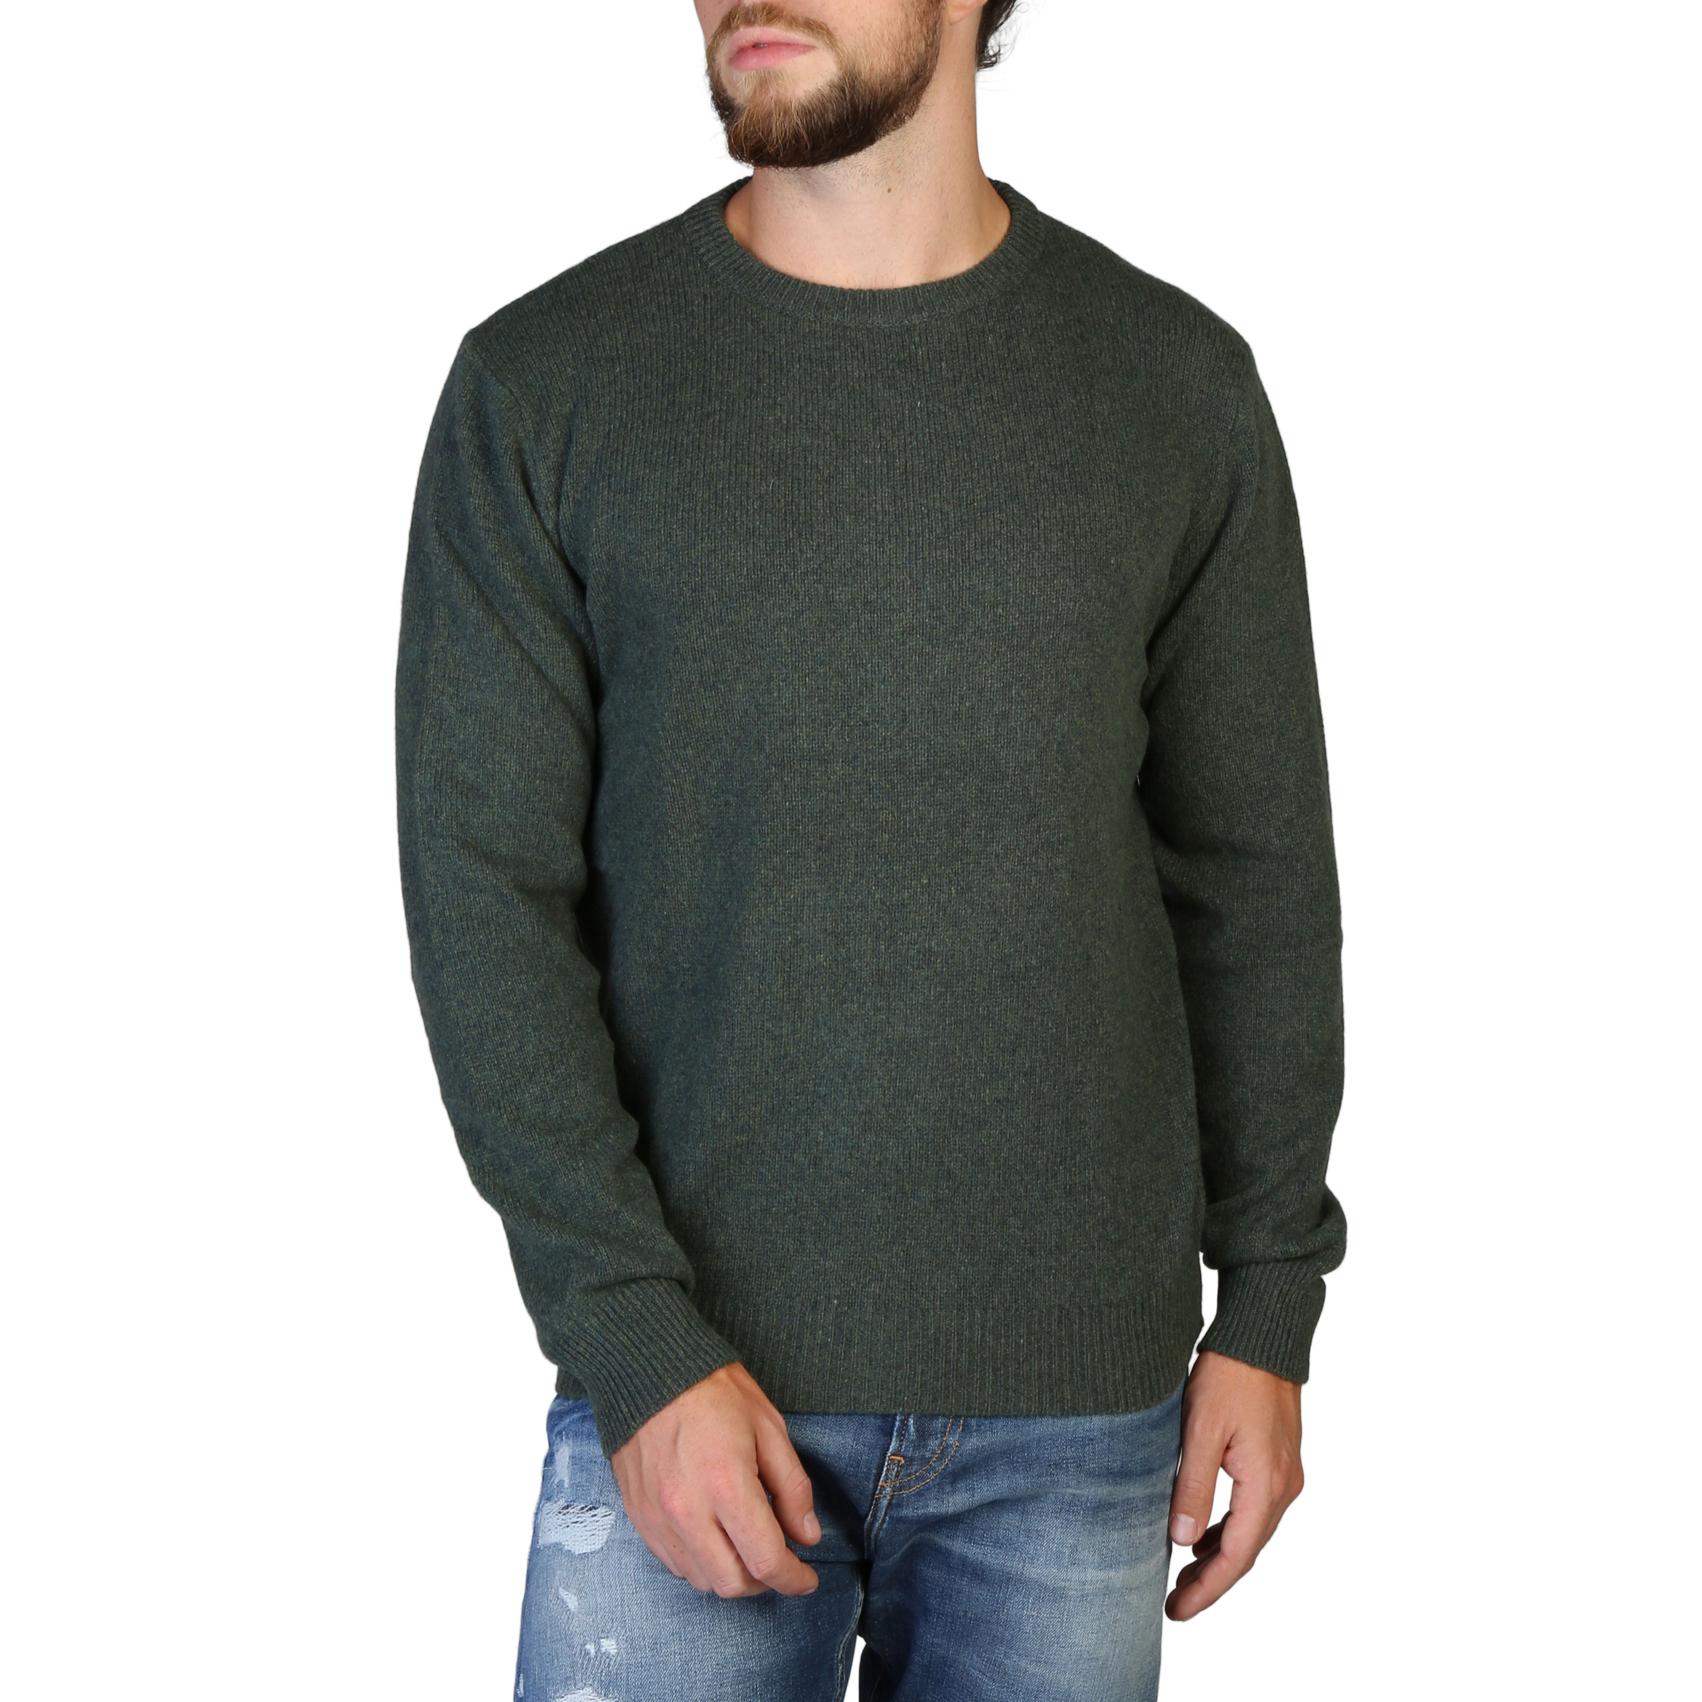 100% Cashmere - C-NECK-M - Green